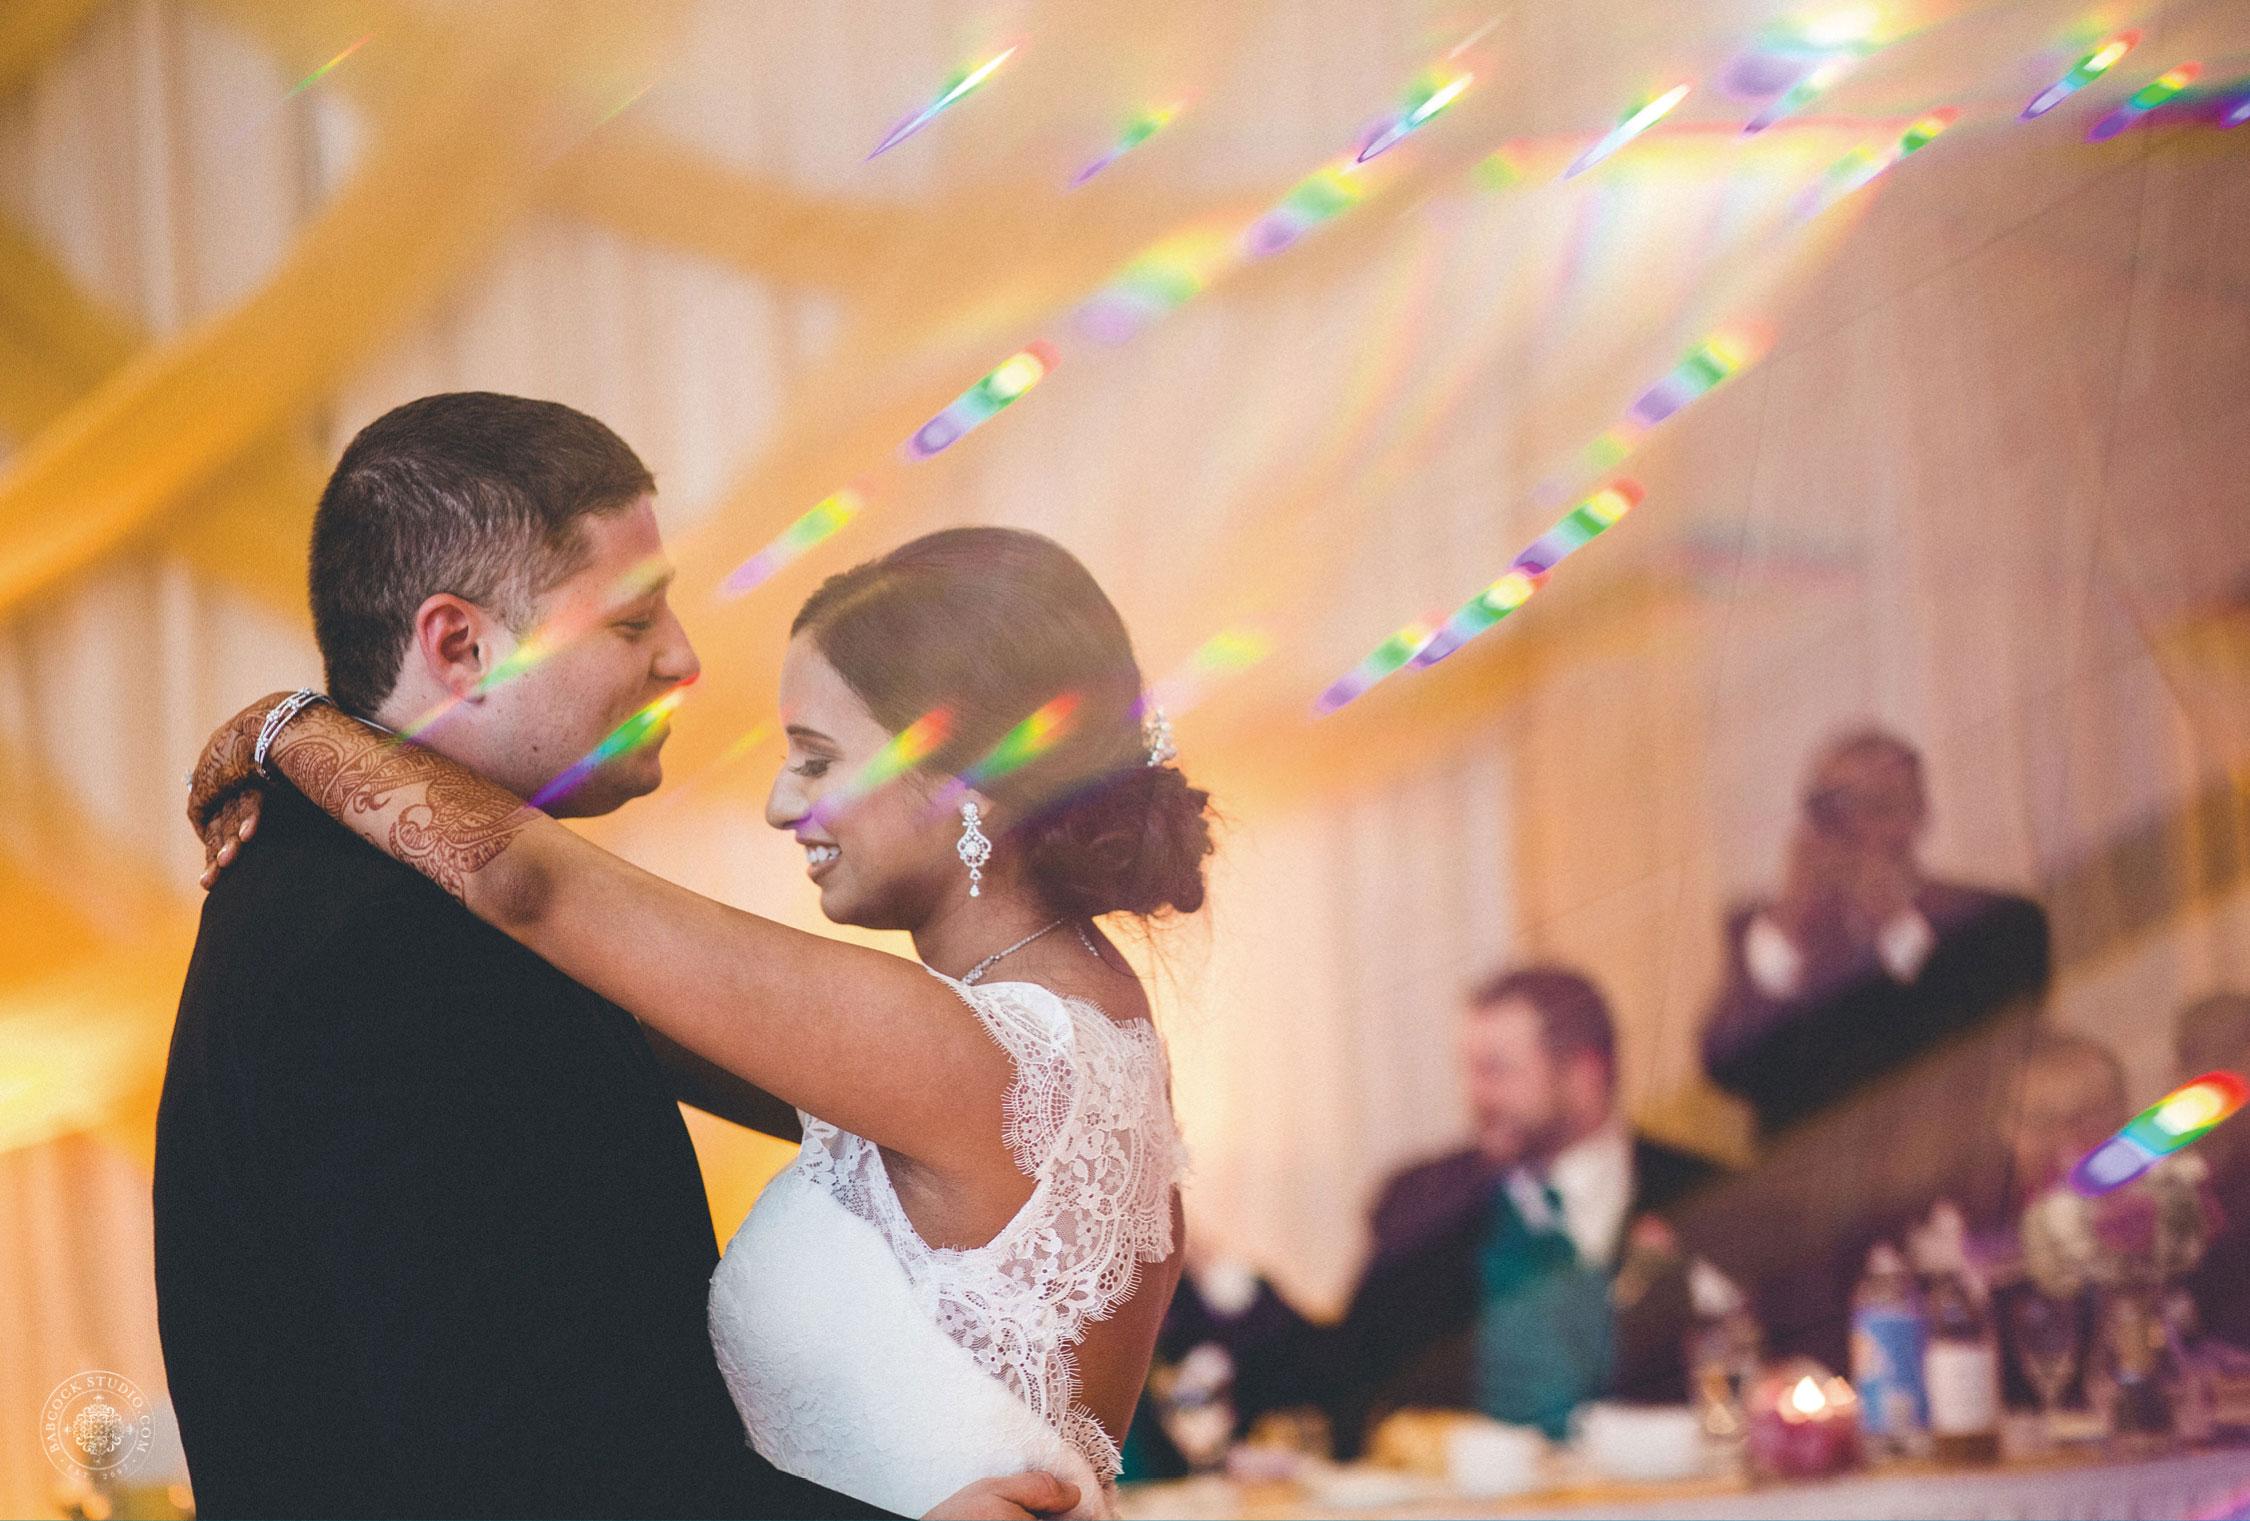 mayuri-brent-indian-wedding-photographer-dayton-ohio-42.jpg